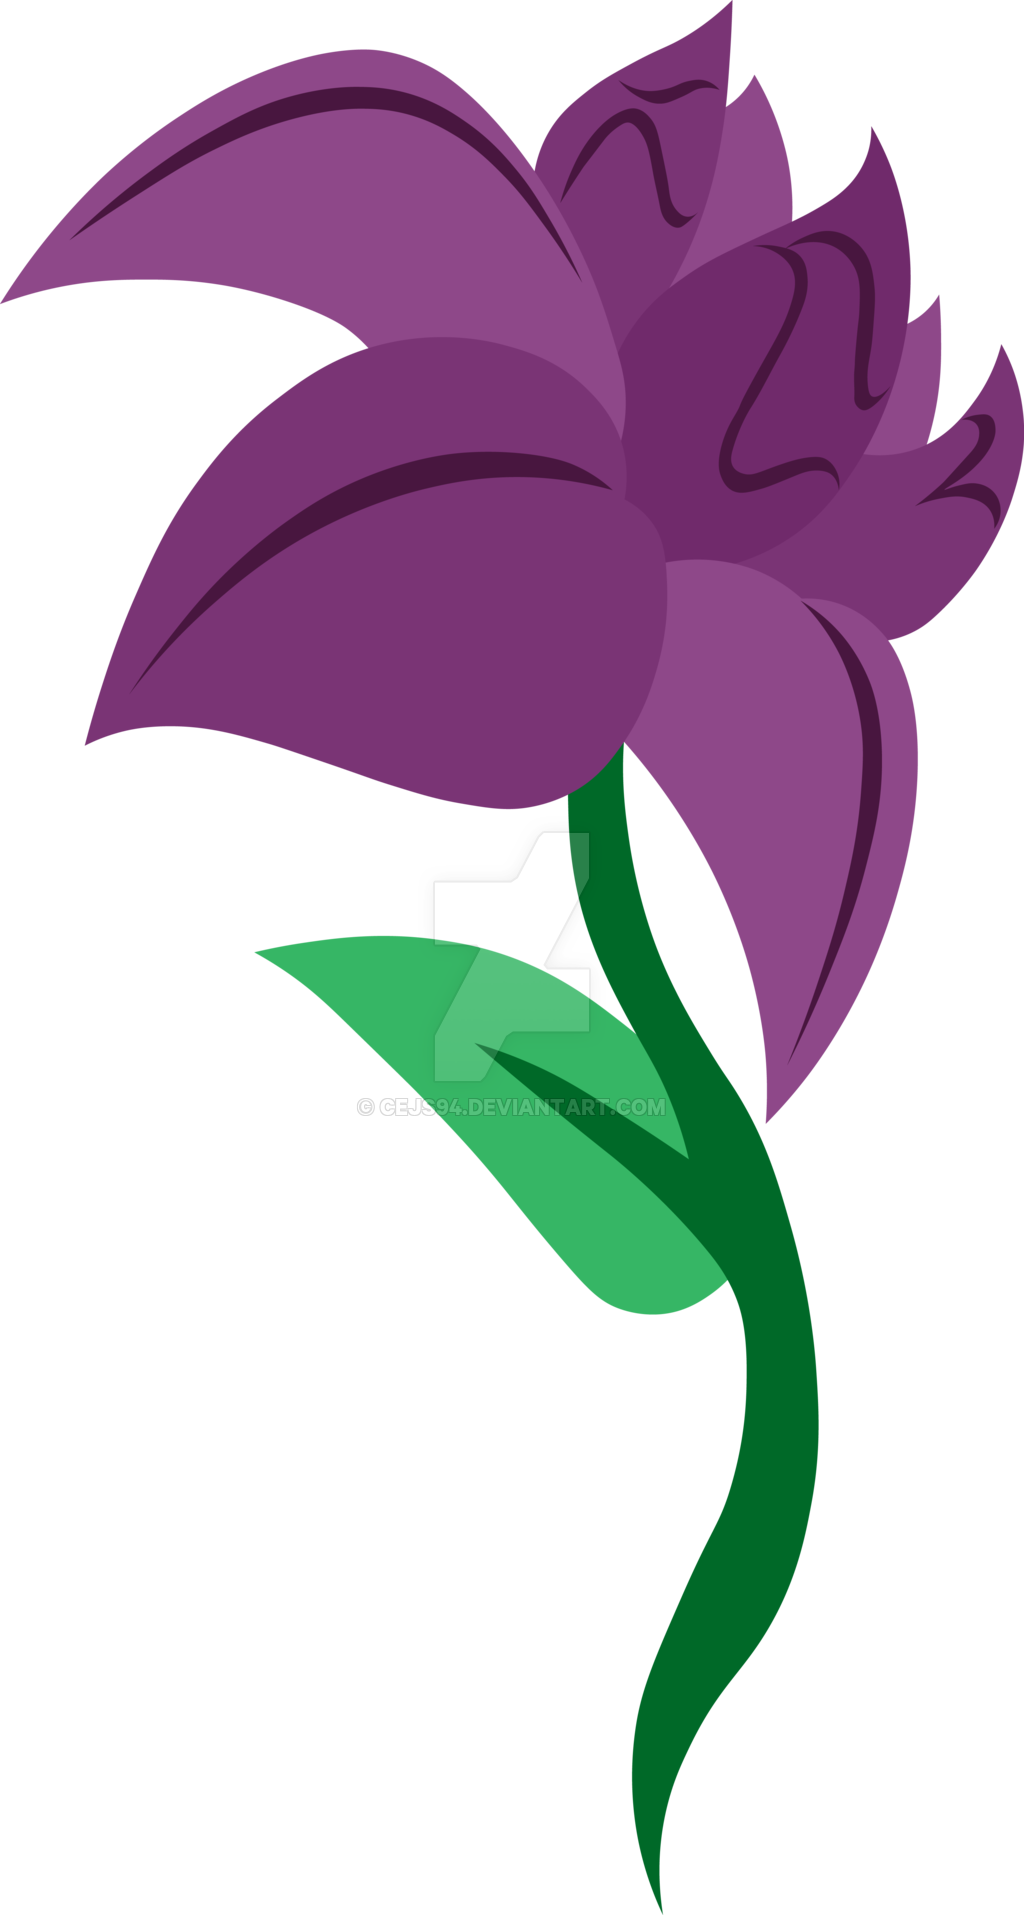 Пони цветов картинки